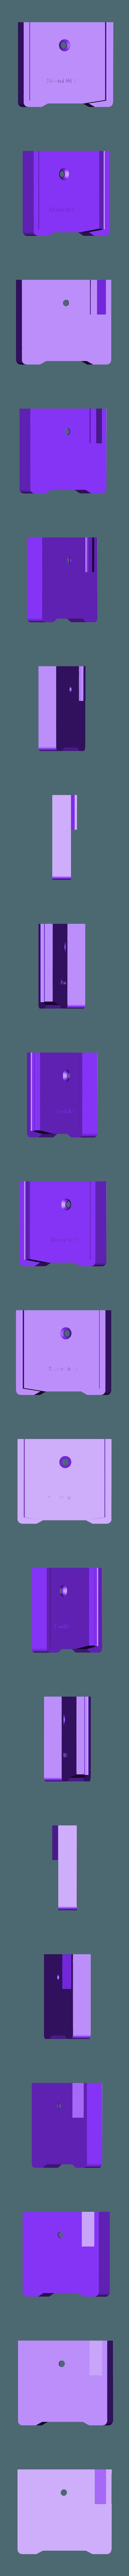 308 holder Support smartphone Xiaomi MI9.STL Download STL file Peugeot 308 smartphone support • 3D printer design, C1-concept